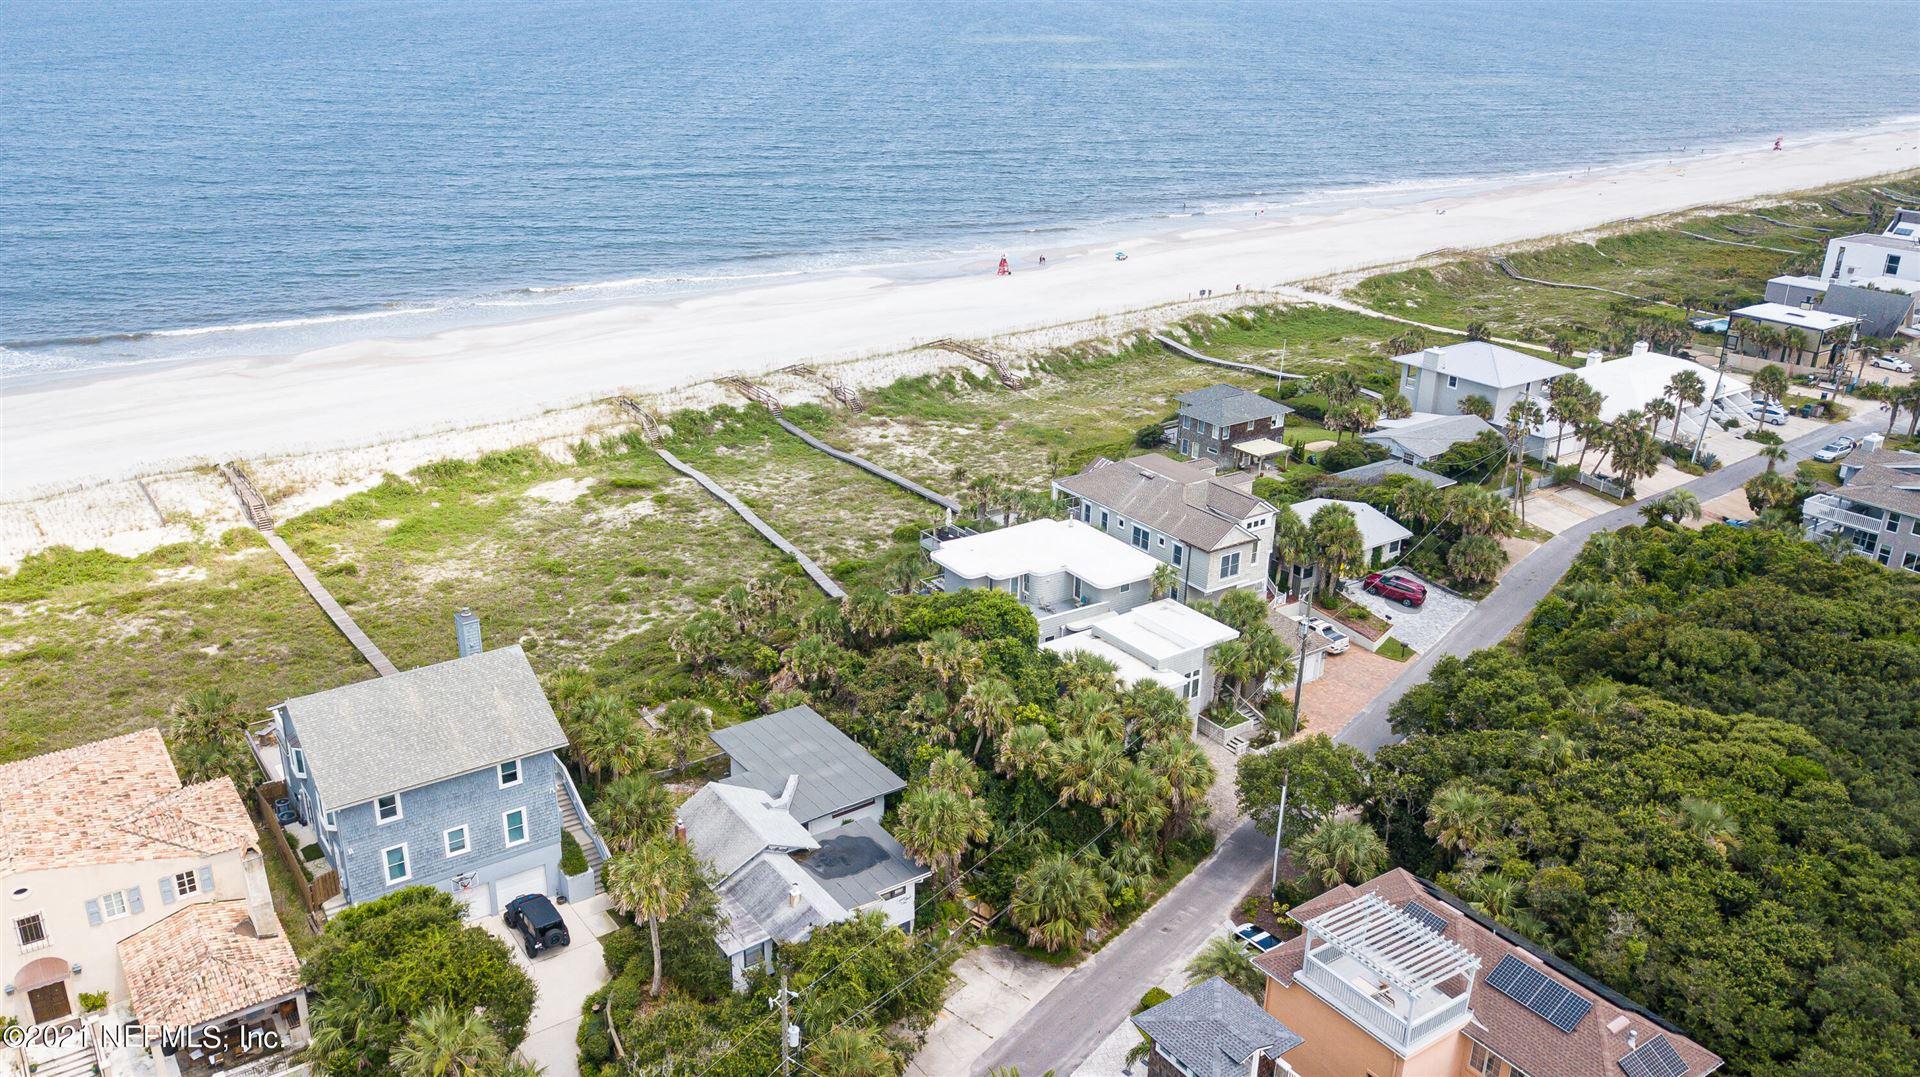 2031 BEACH AVE, Atlantic Beach, FL 32233 - MLS#: 1112156